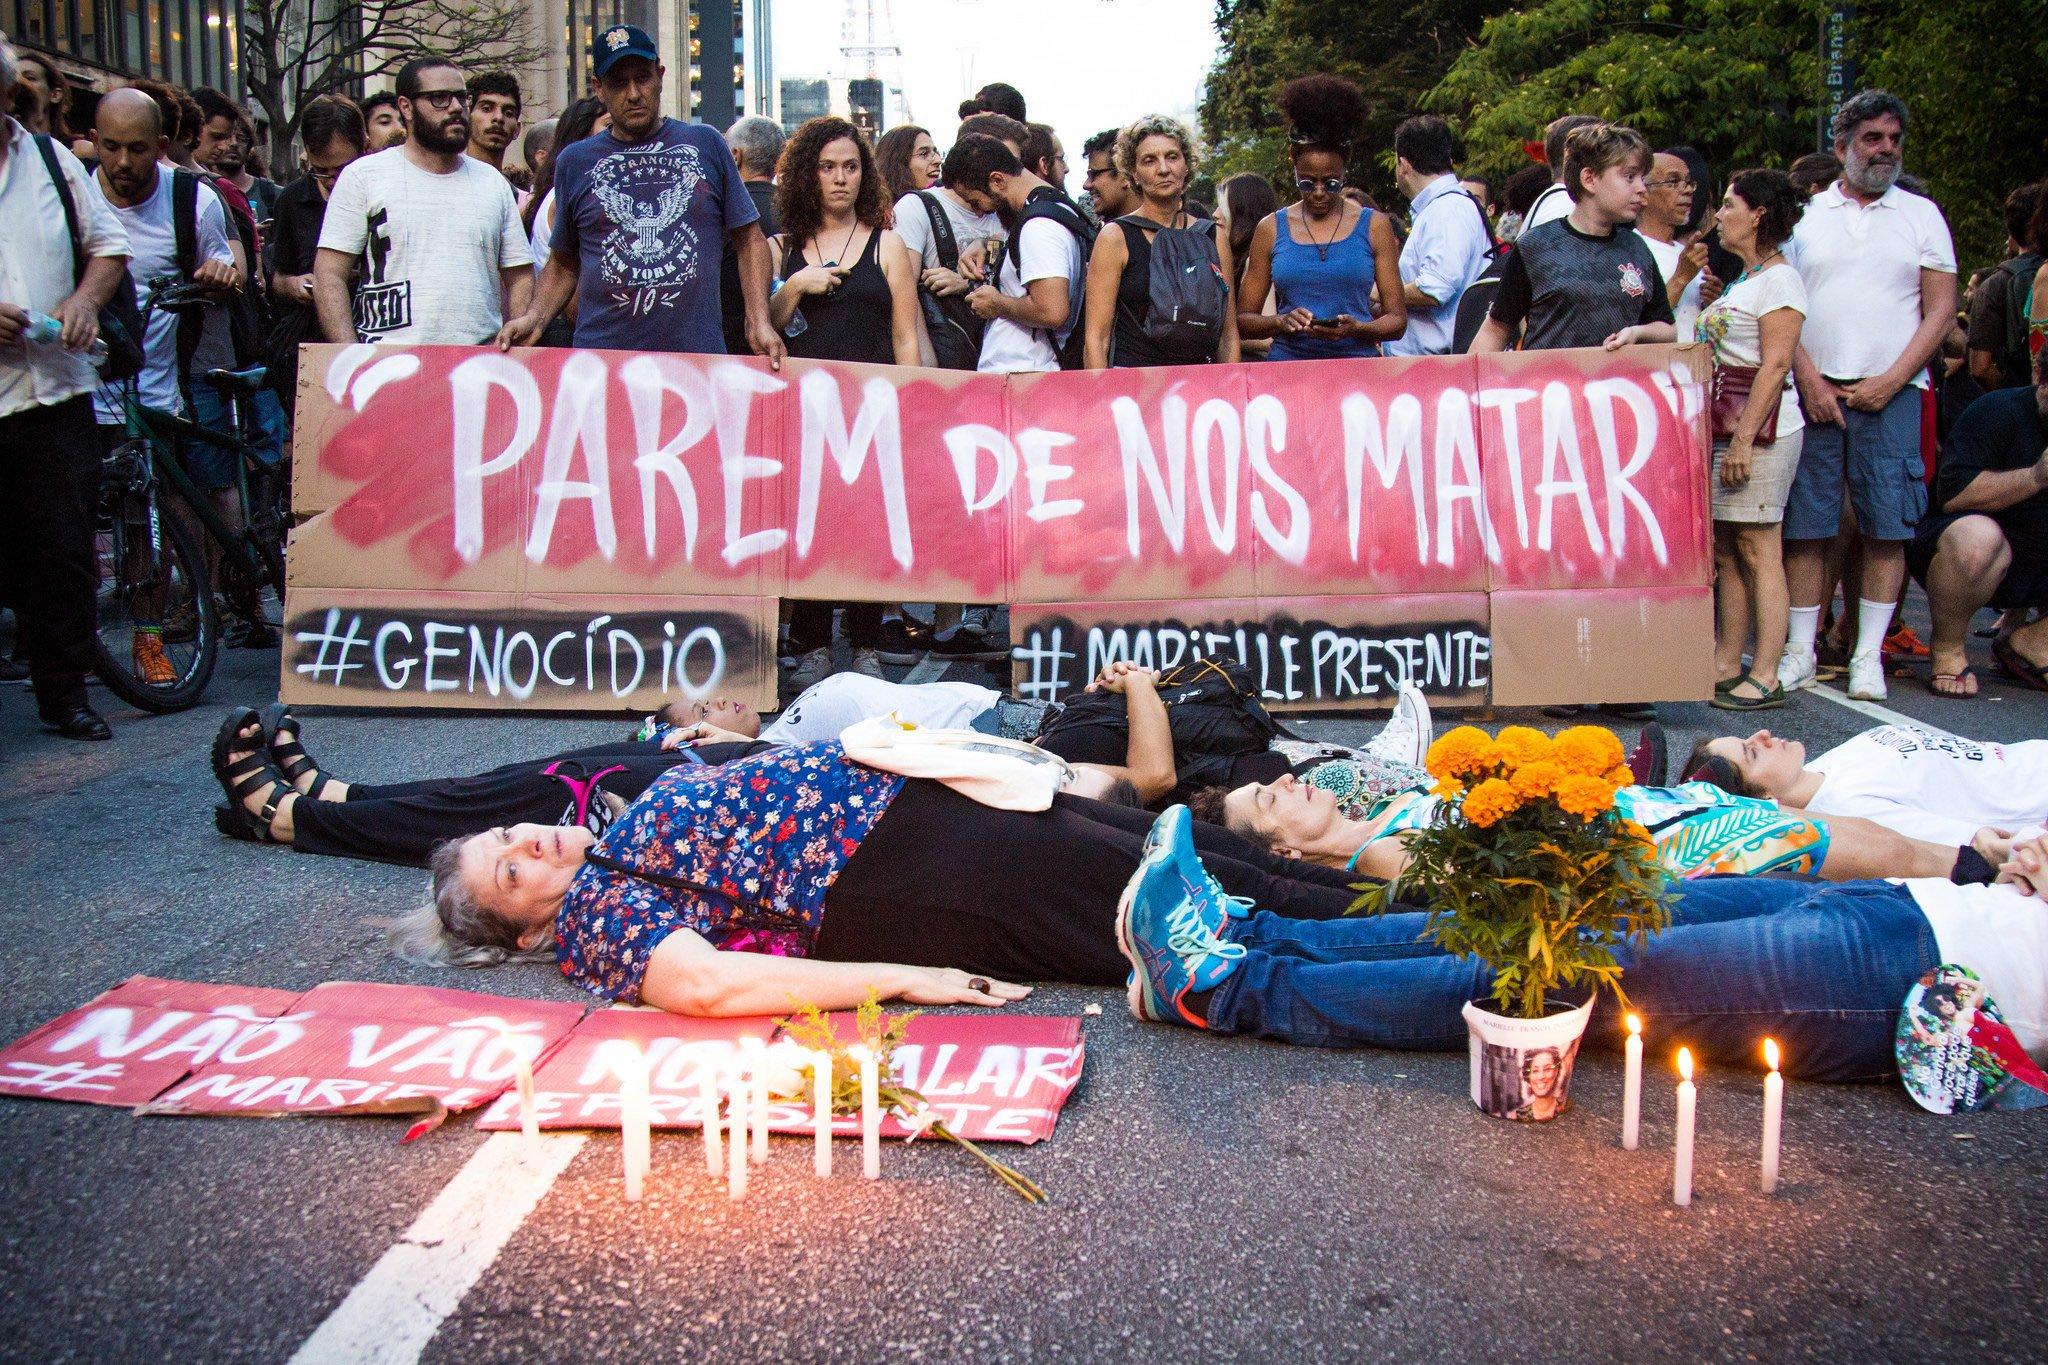 protest-brazil-marielle-franco-femicide-flickr-romerito-pontes.jpg